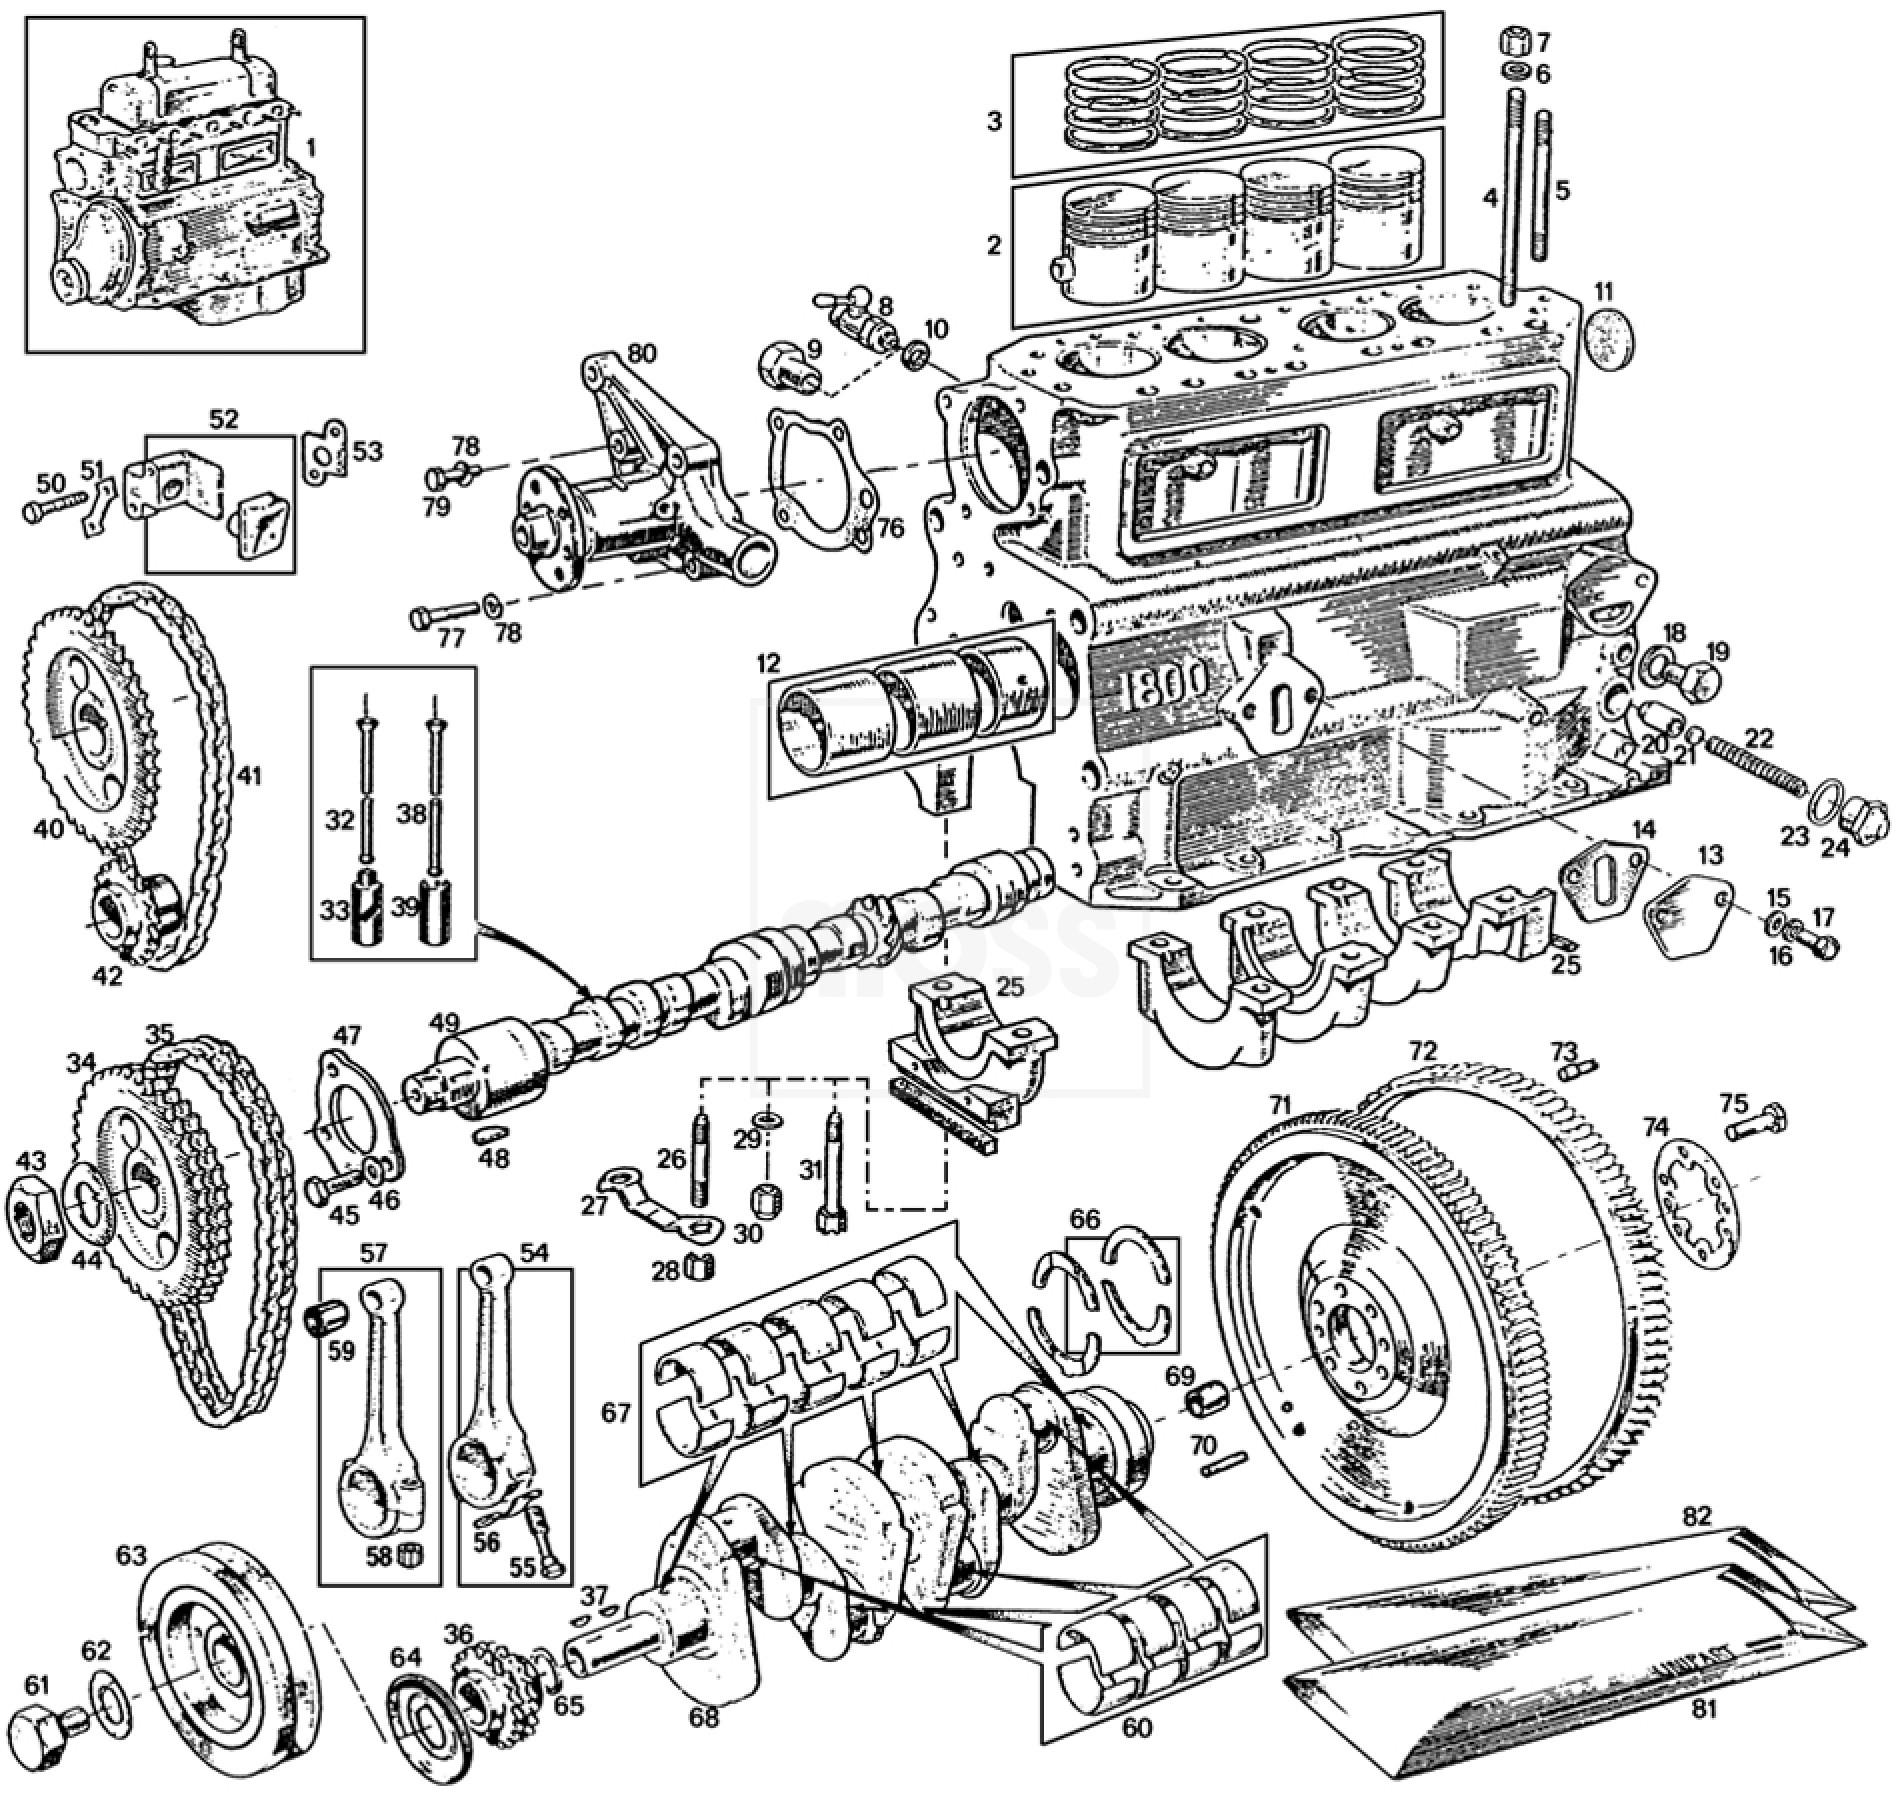 hight resolution of 1976 mgb engine diagram wiring diagram yer 1976 mgb engine diagram